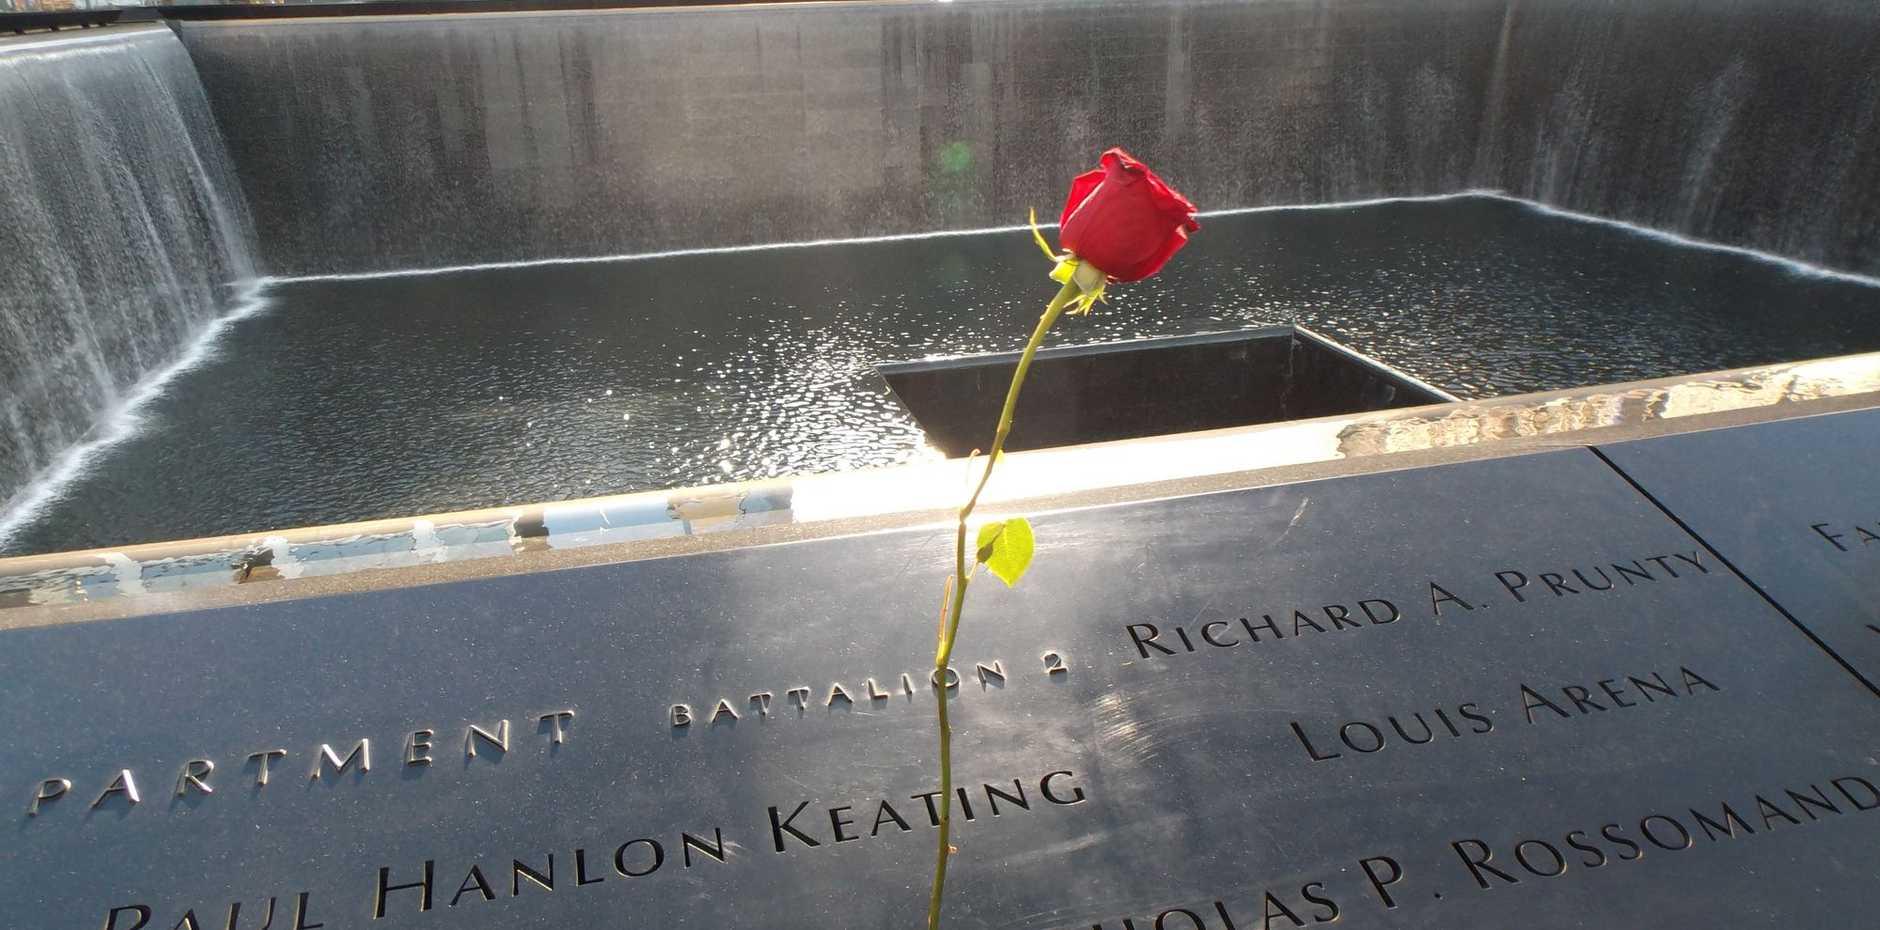 The September 11 memorial site in New York.